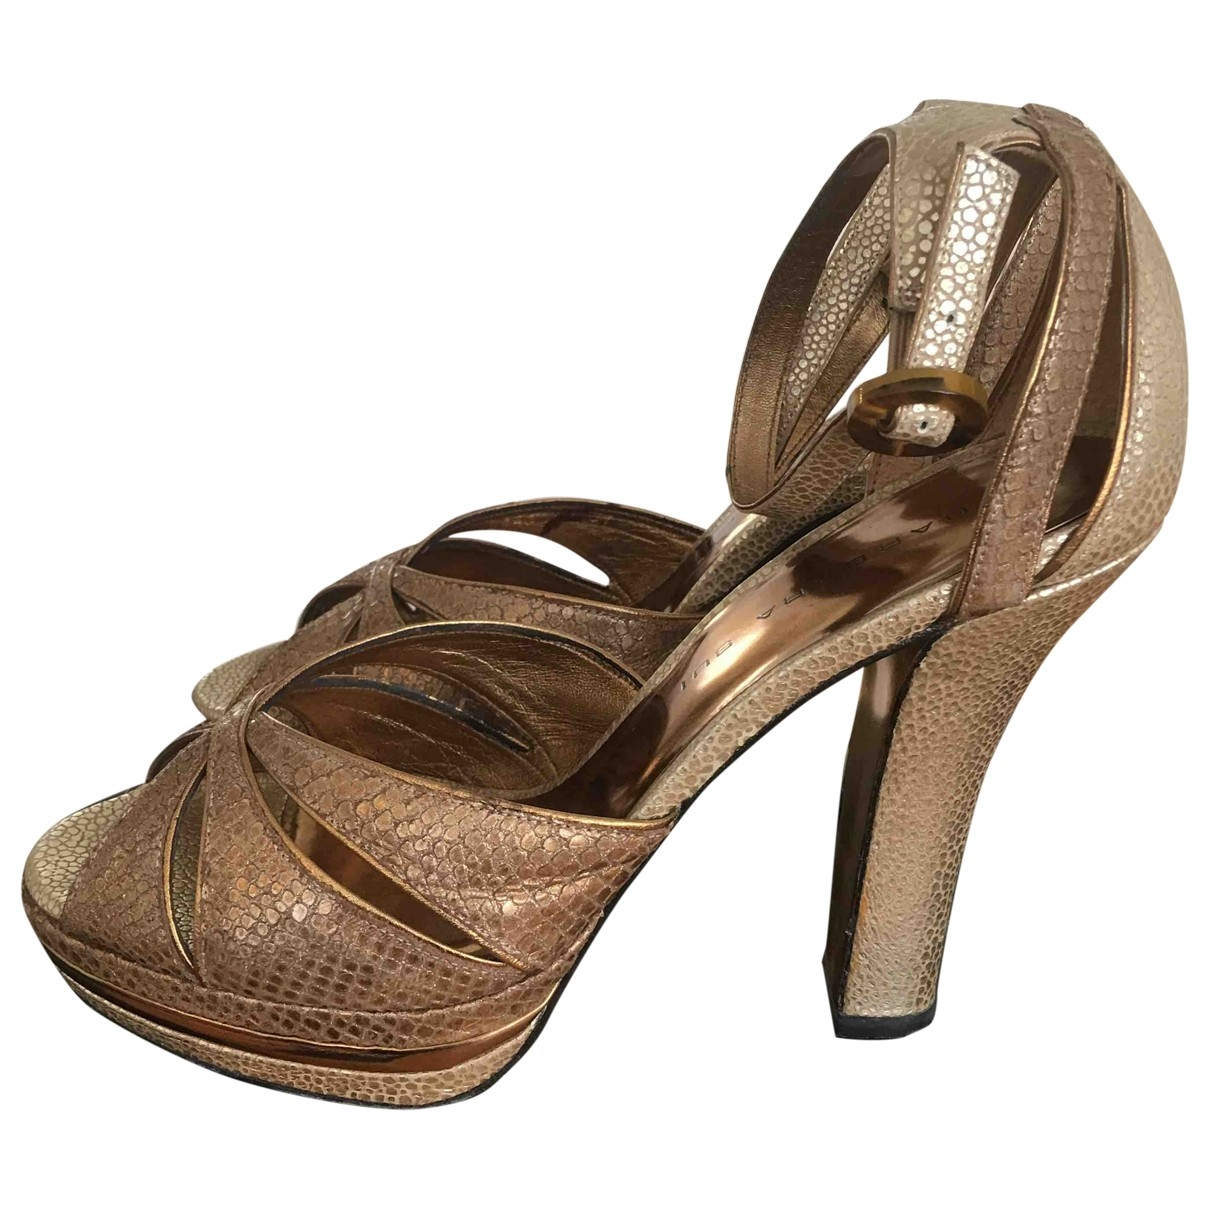 Barbara Bui \N Gold Exotic leathers Sandals for Women 37 EU